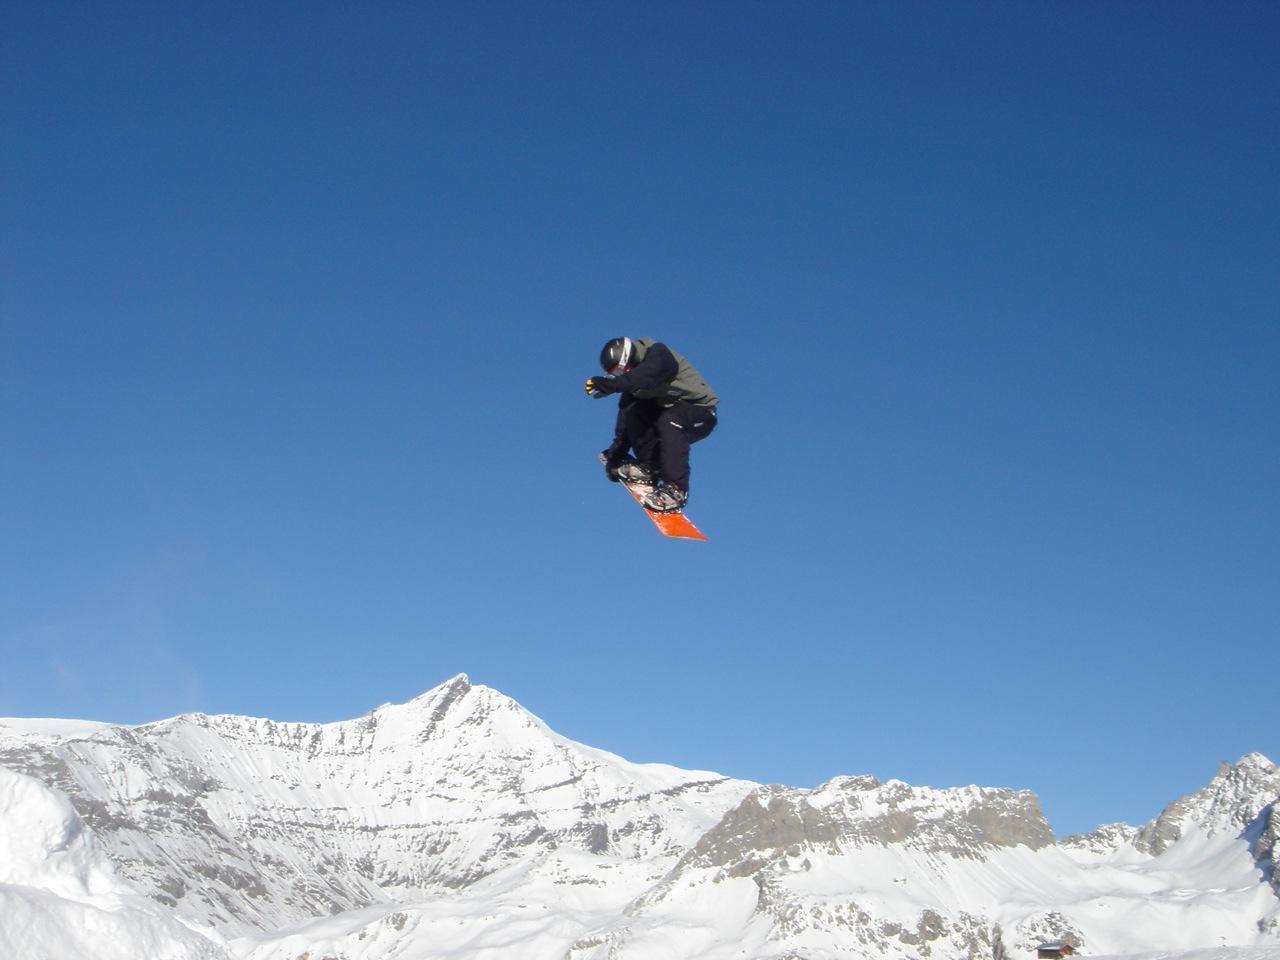 Ski jump image from wikimedia